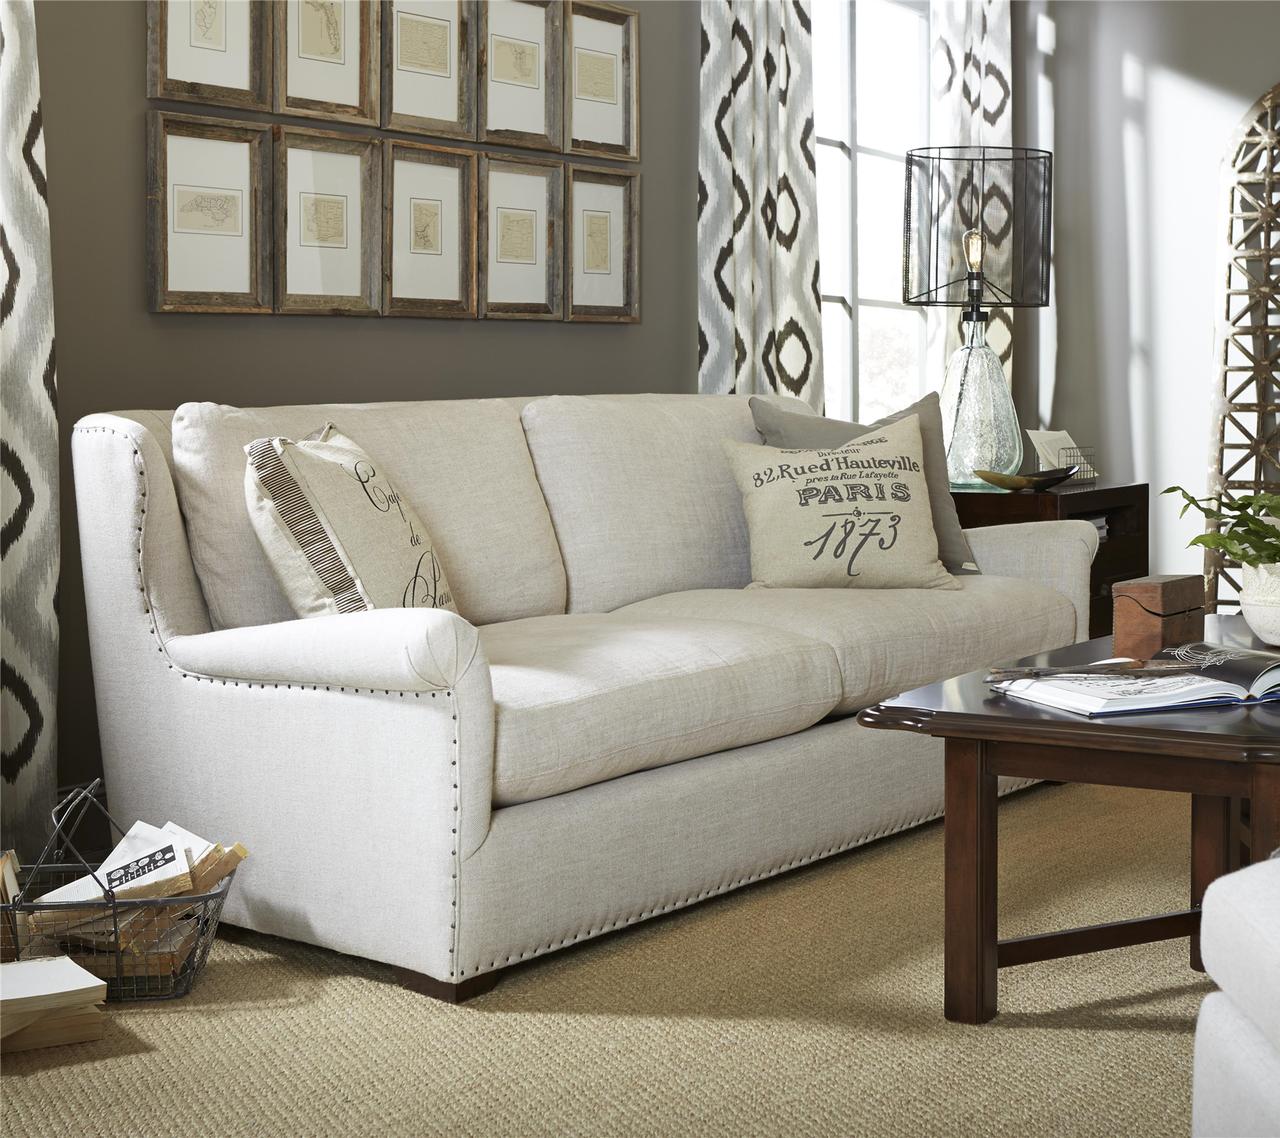 Modern Eclectic Living Room Furniture Zin Home -  haven belgian linen upholstered wingback sofas